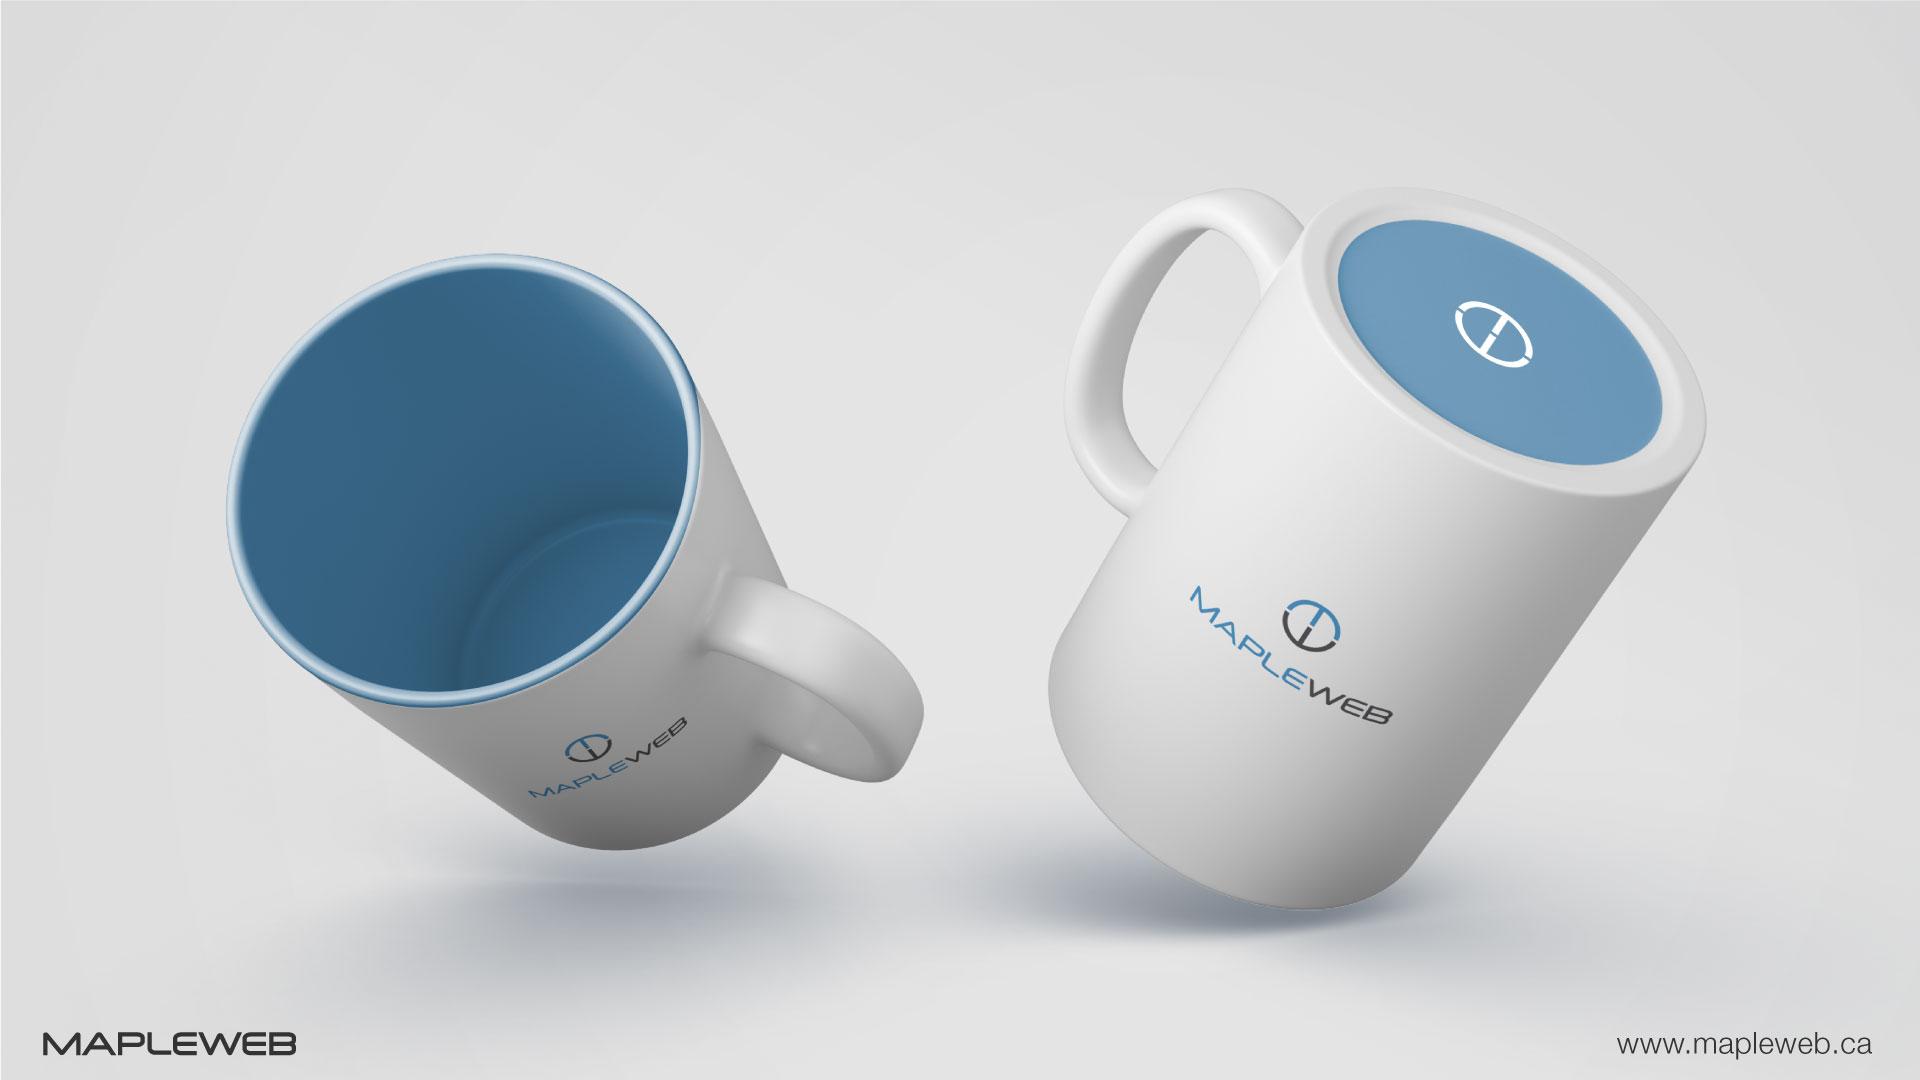 mapleweb-brand-logo-design-by-mapleweb-vancouver-canada-mug-mock